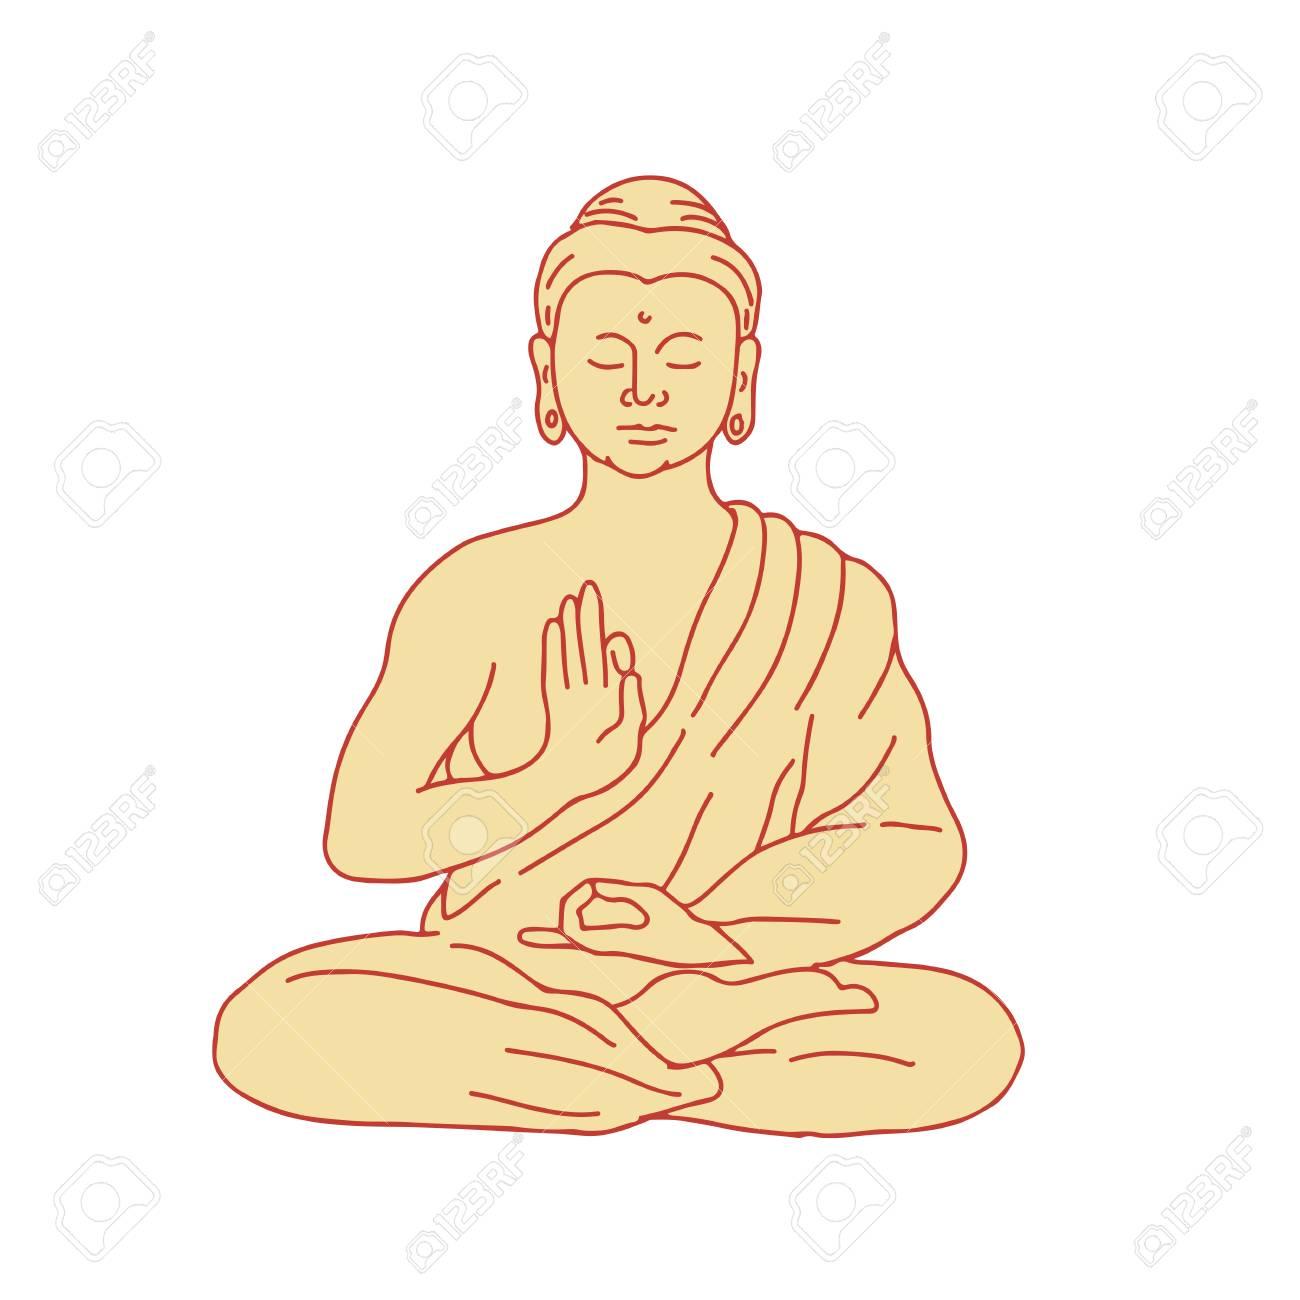 Drawing Sketch Style Illustration Of Gautama Buddha Siddhartha 1300x1300